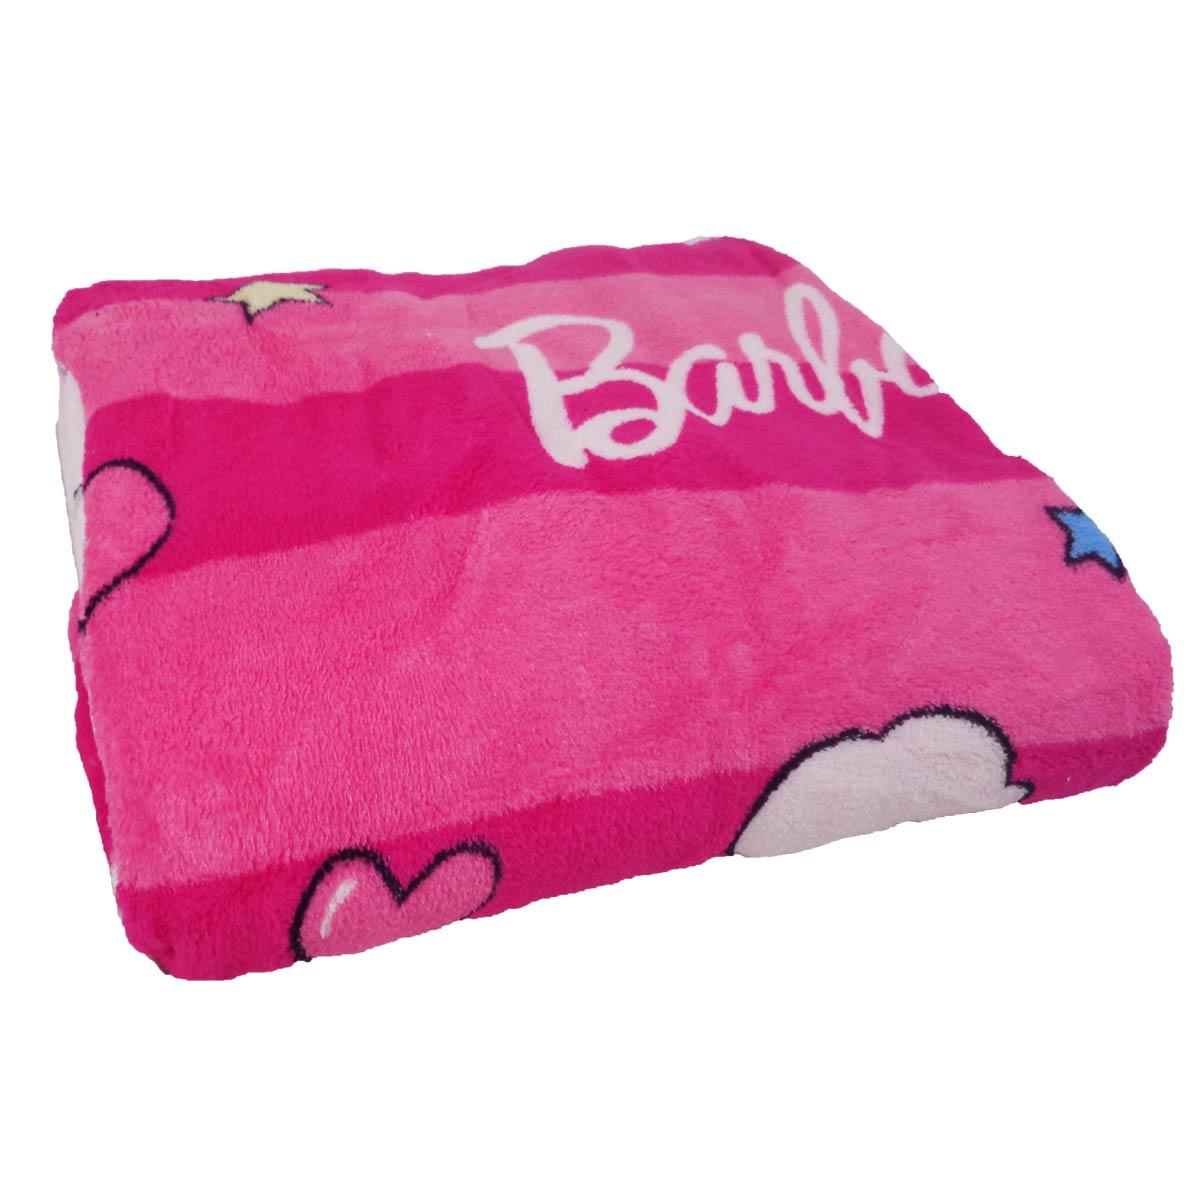 Manta Almofada Infantil Barbie Rosa Menina Microfibra Jolitex